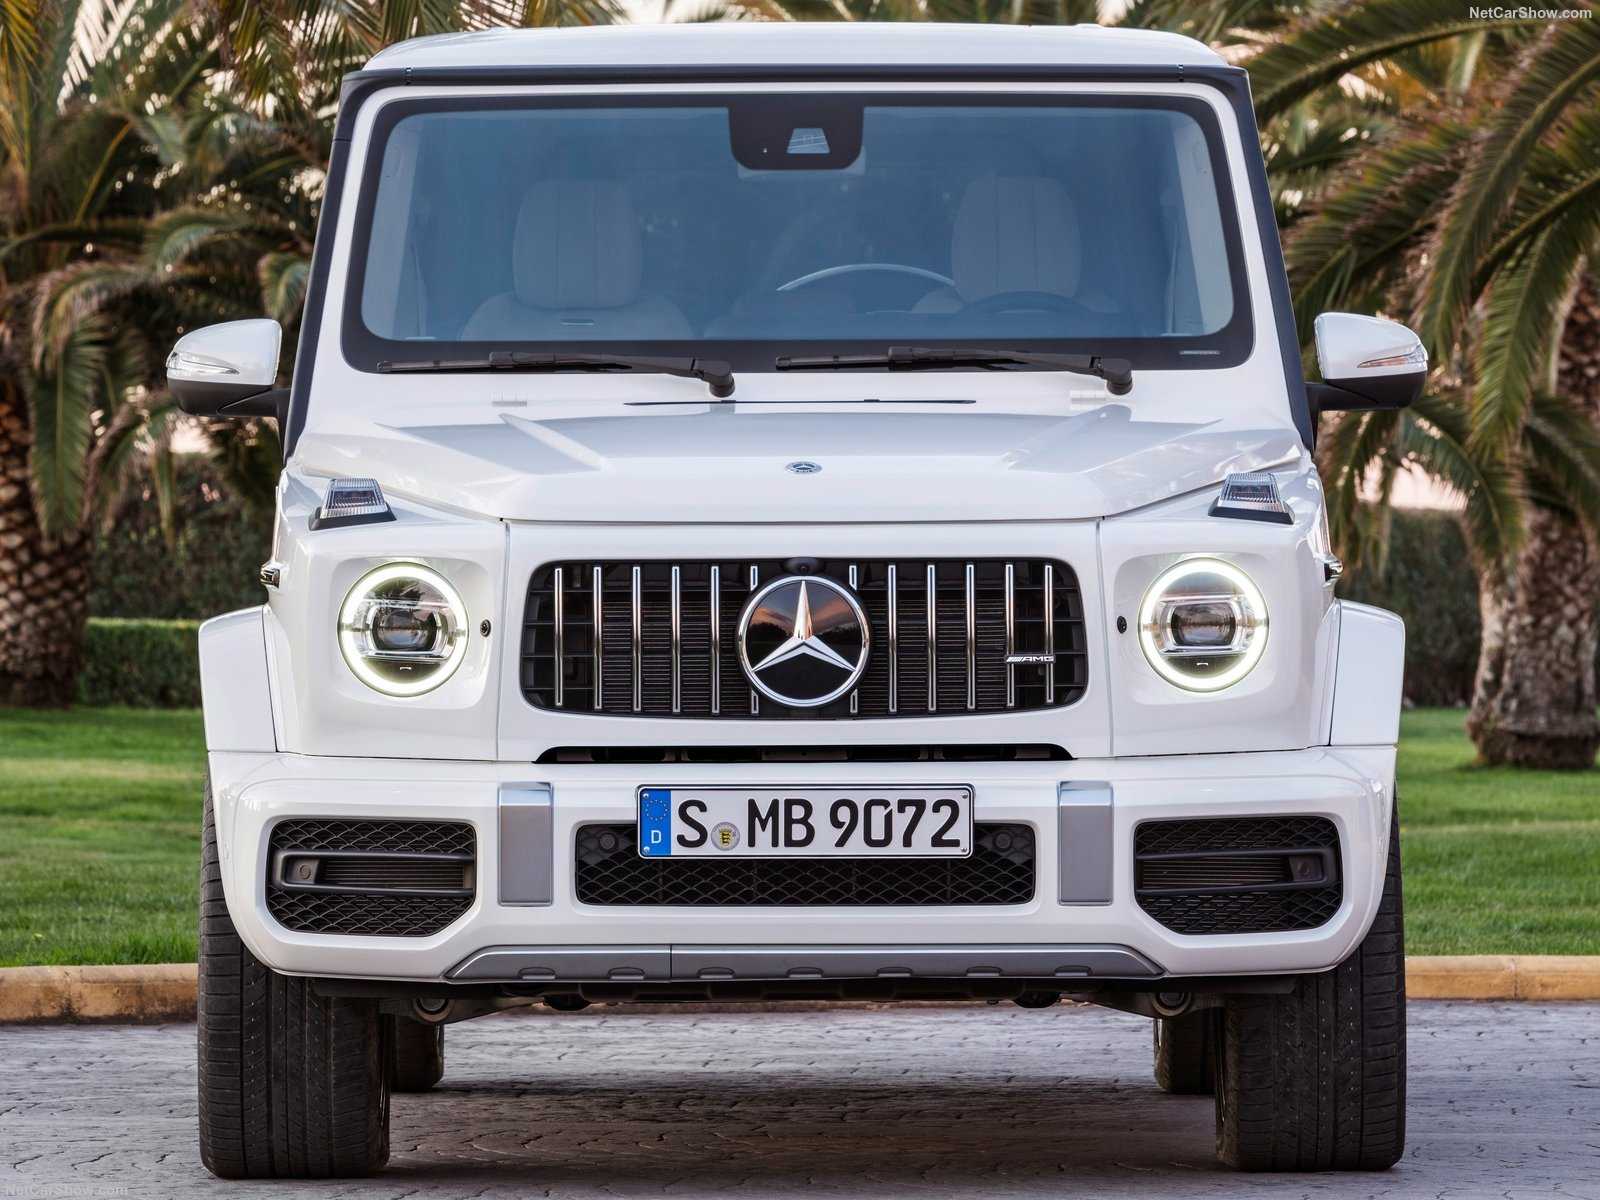 Mercedes_G63_AMG 2019